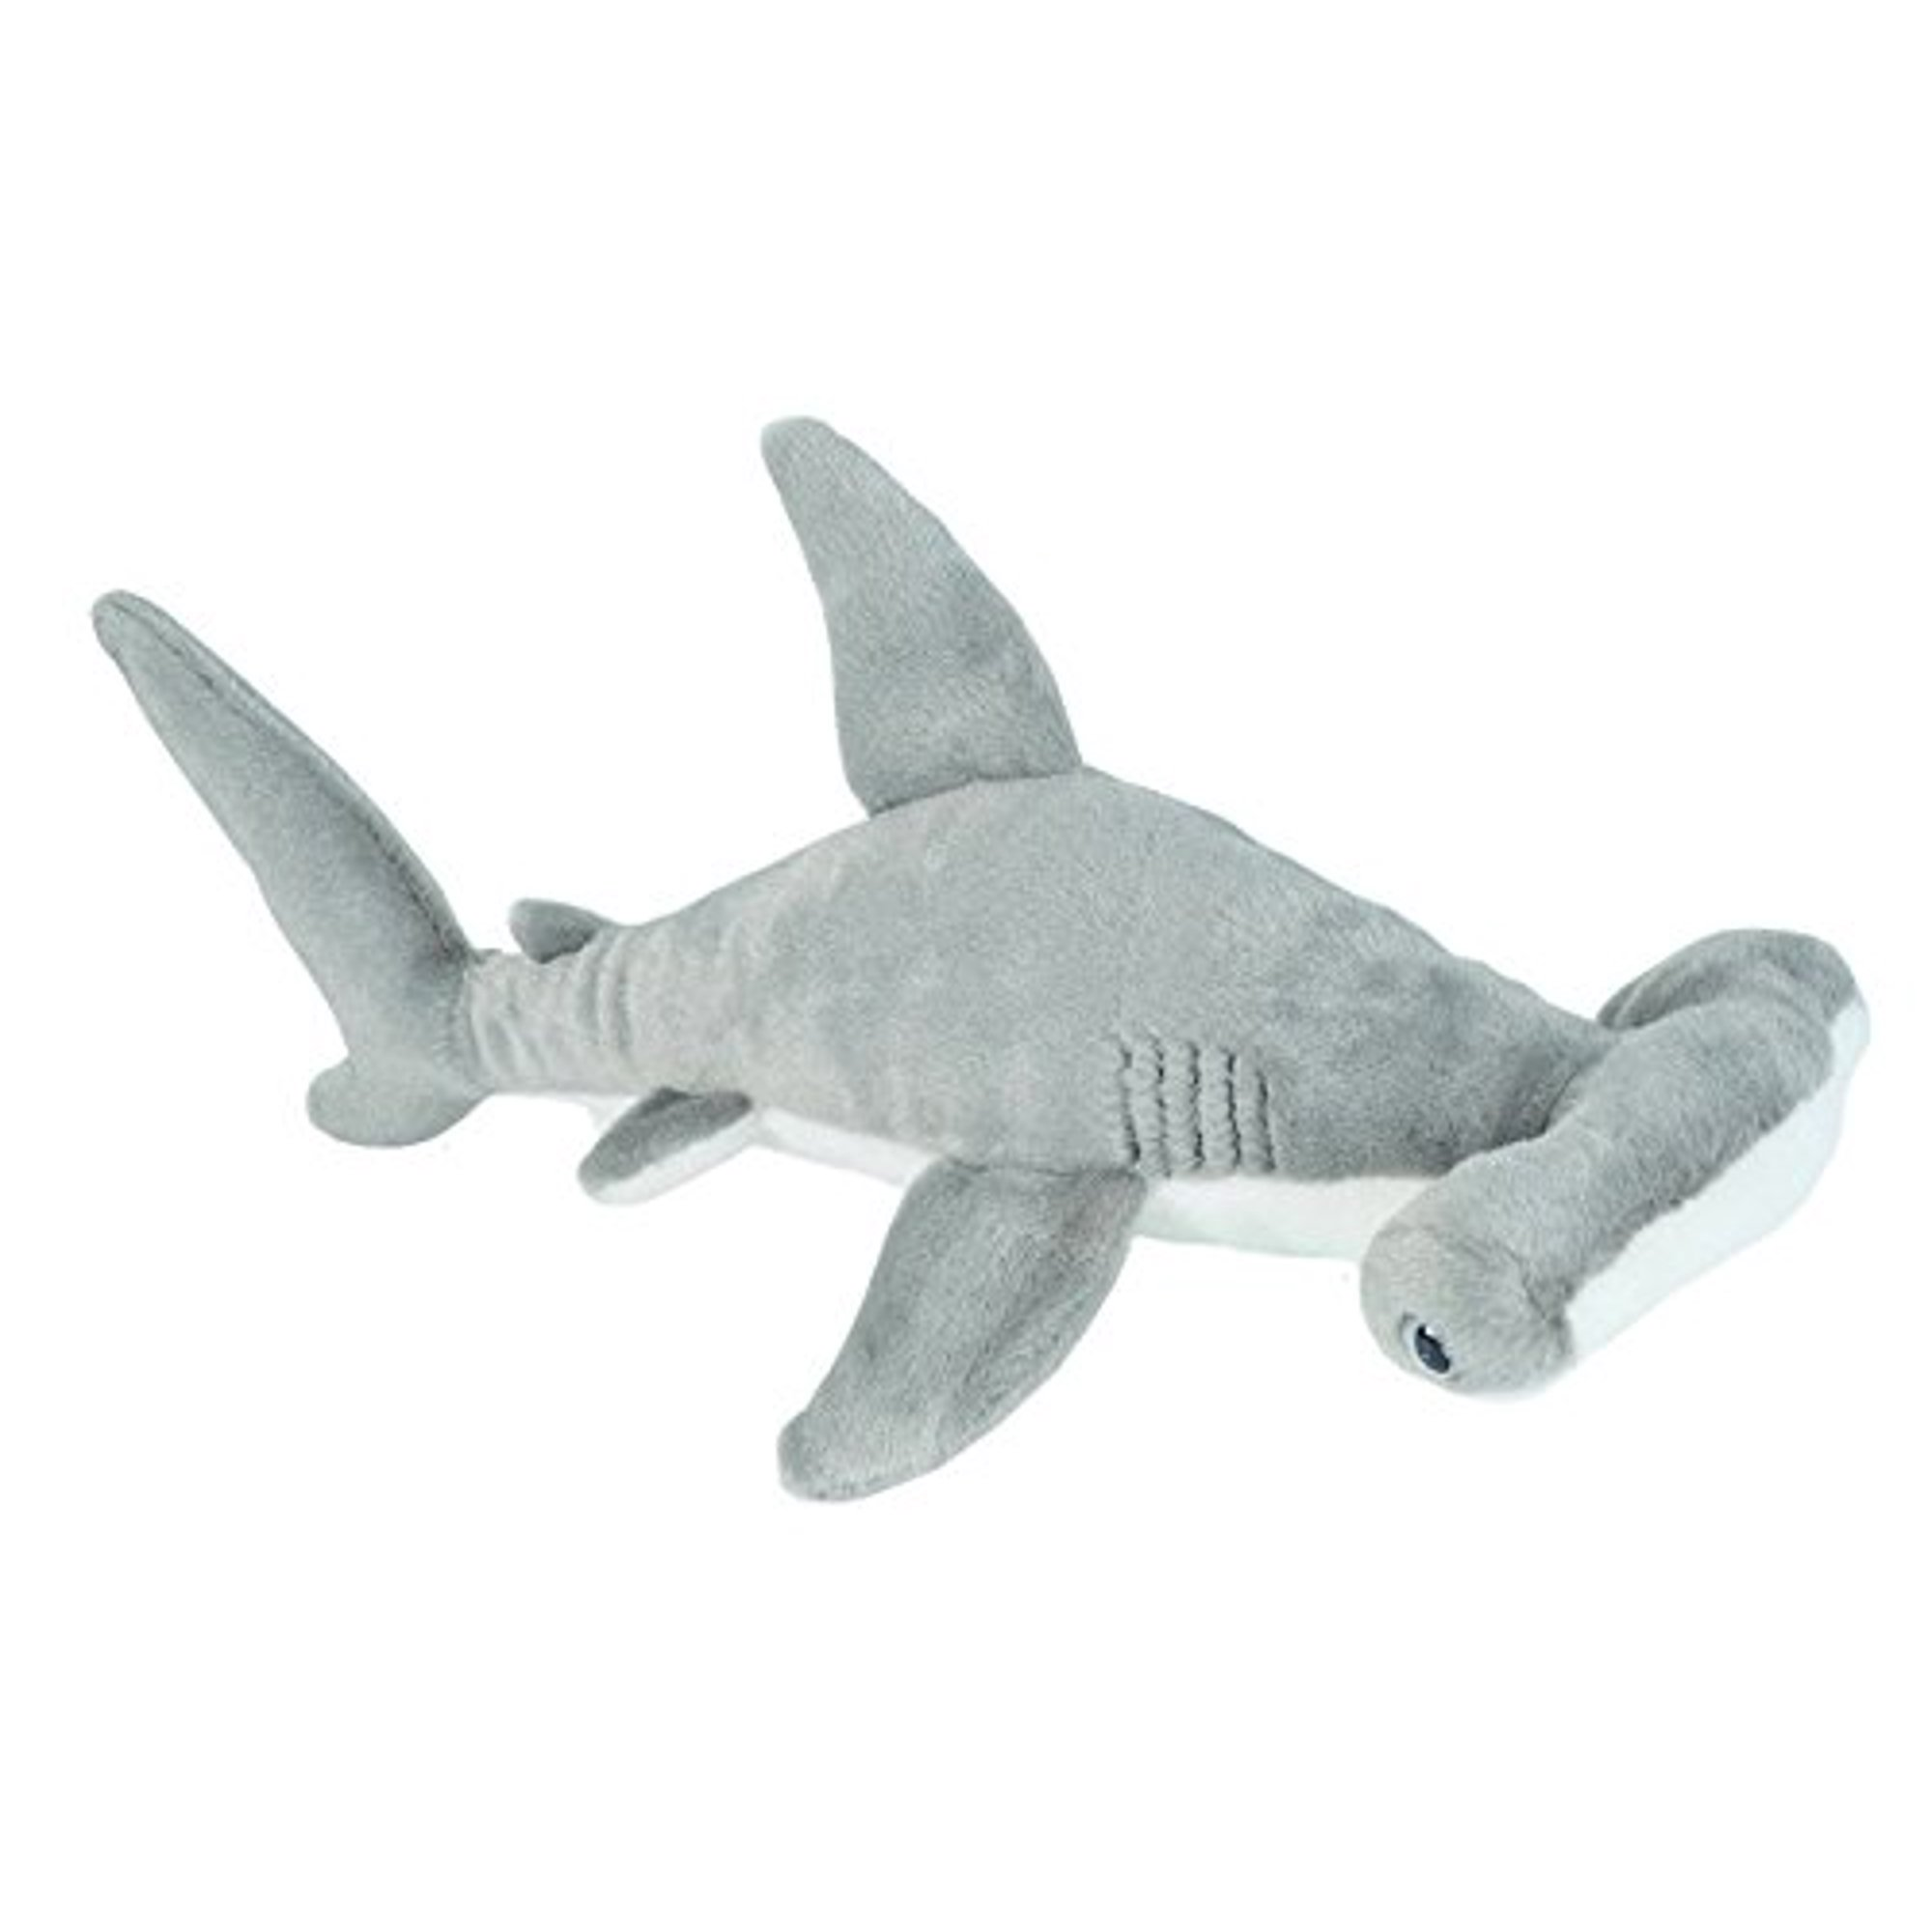 Wild Republic Hammerhead Shark Plush Stuffed Animal Plush Toy Gifts For Kids Cuddlekins 13 Inches Walmart Canada